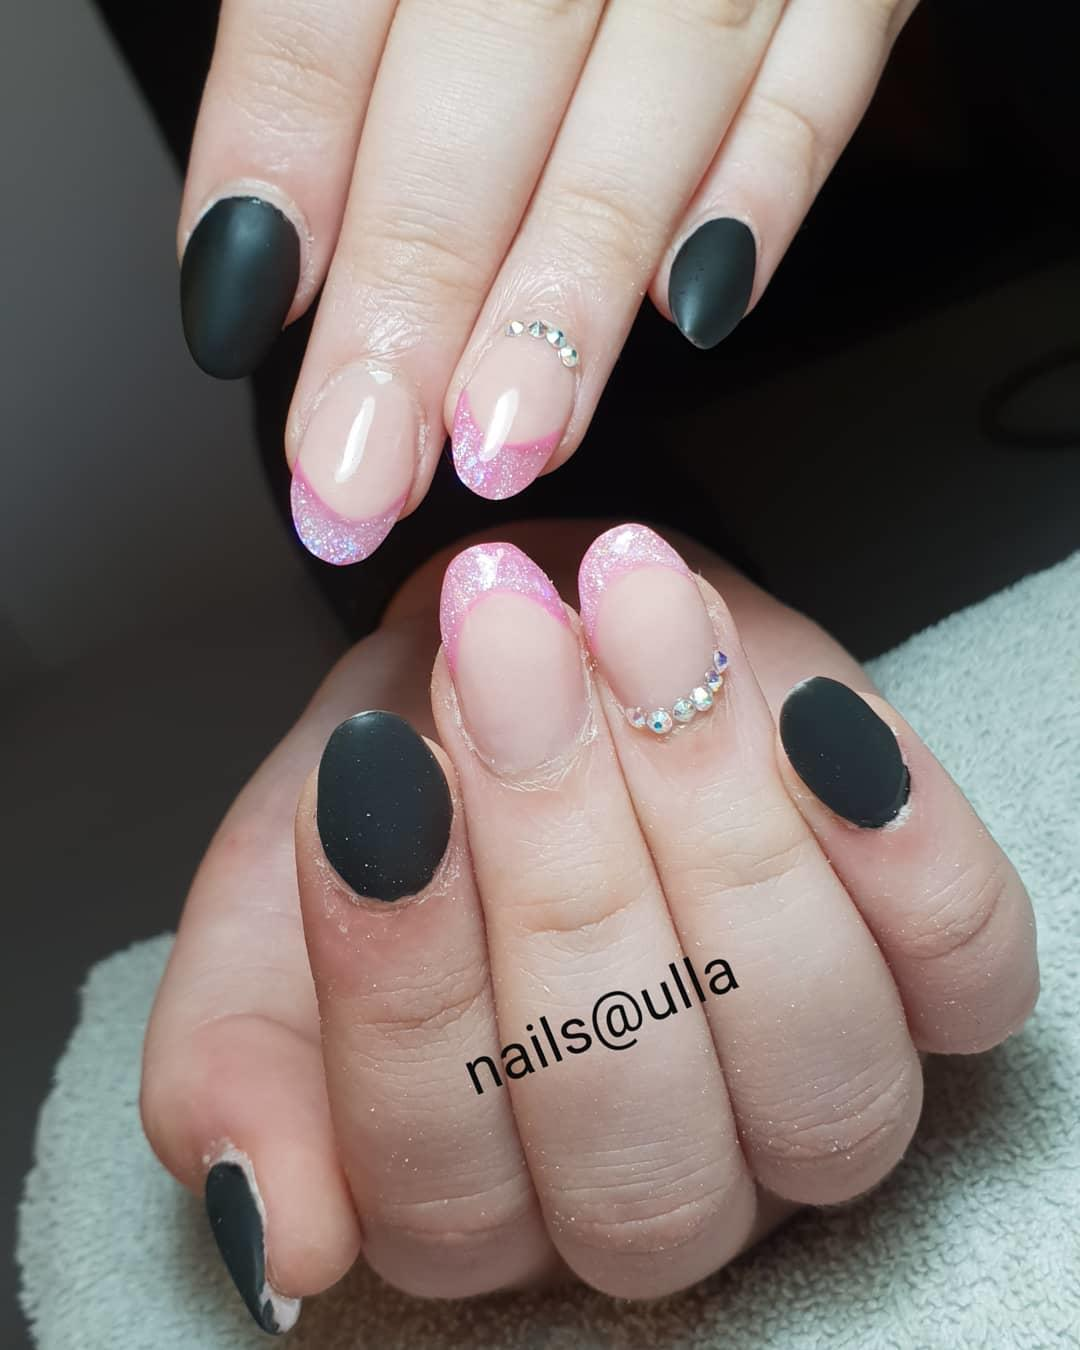 cool pink nail designs 2019 3 - 21 Cool Pink Nail Designs 2019